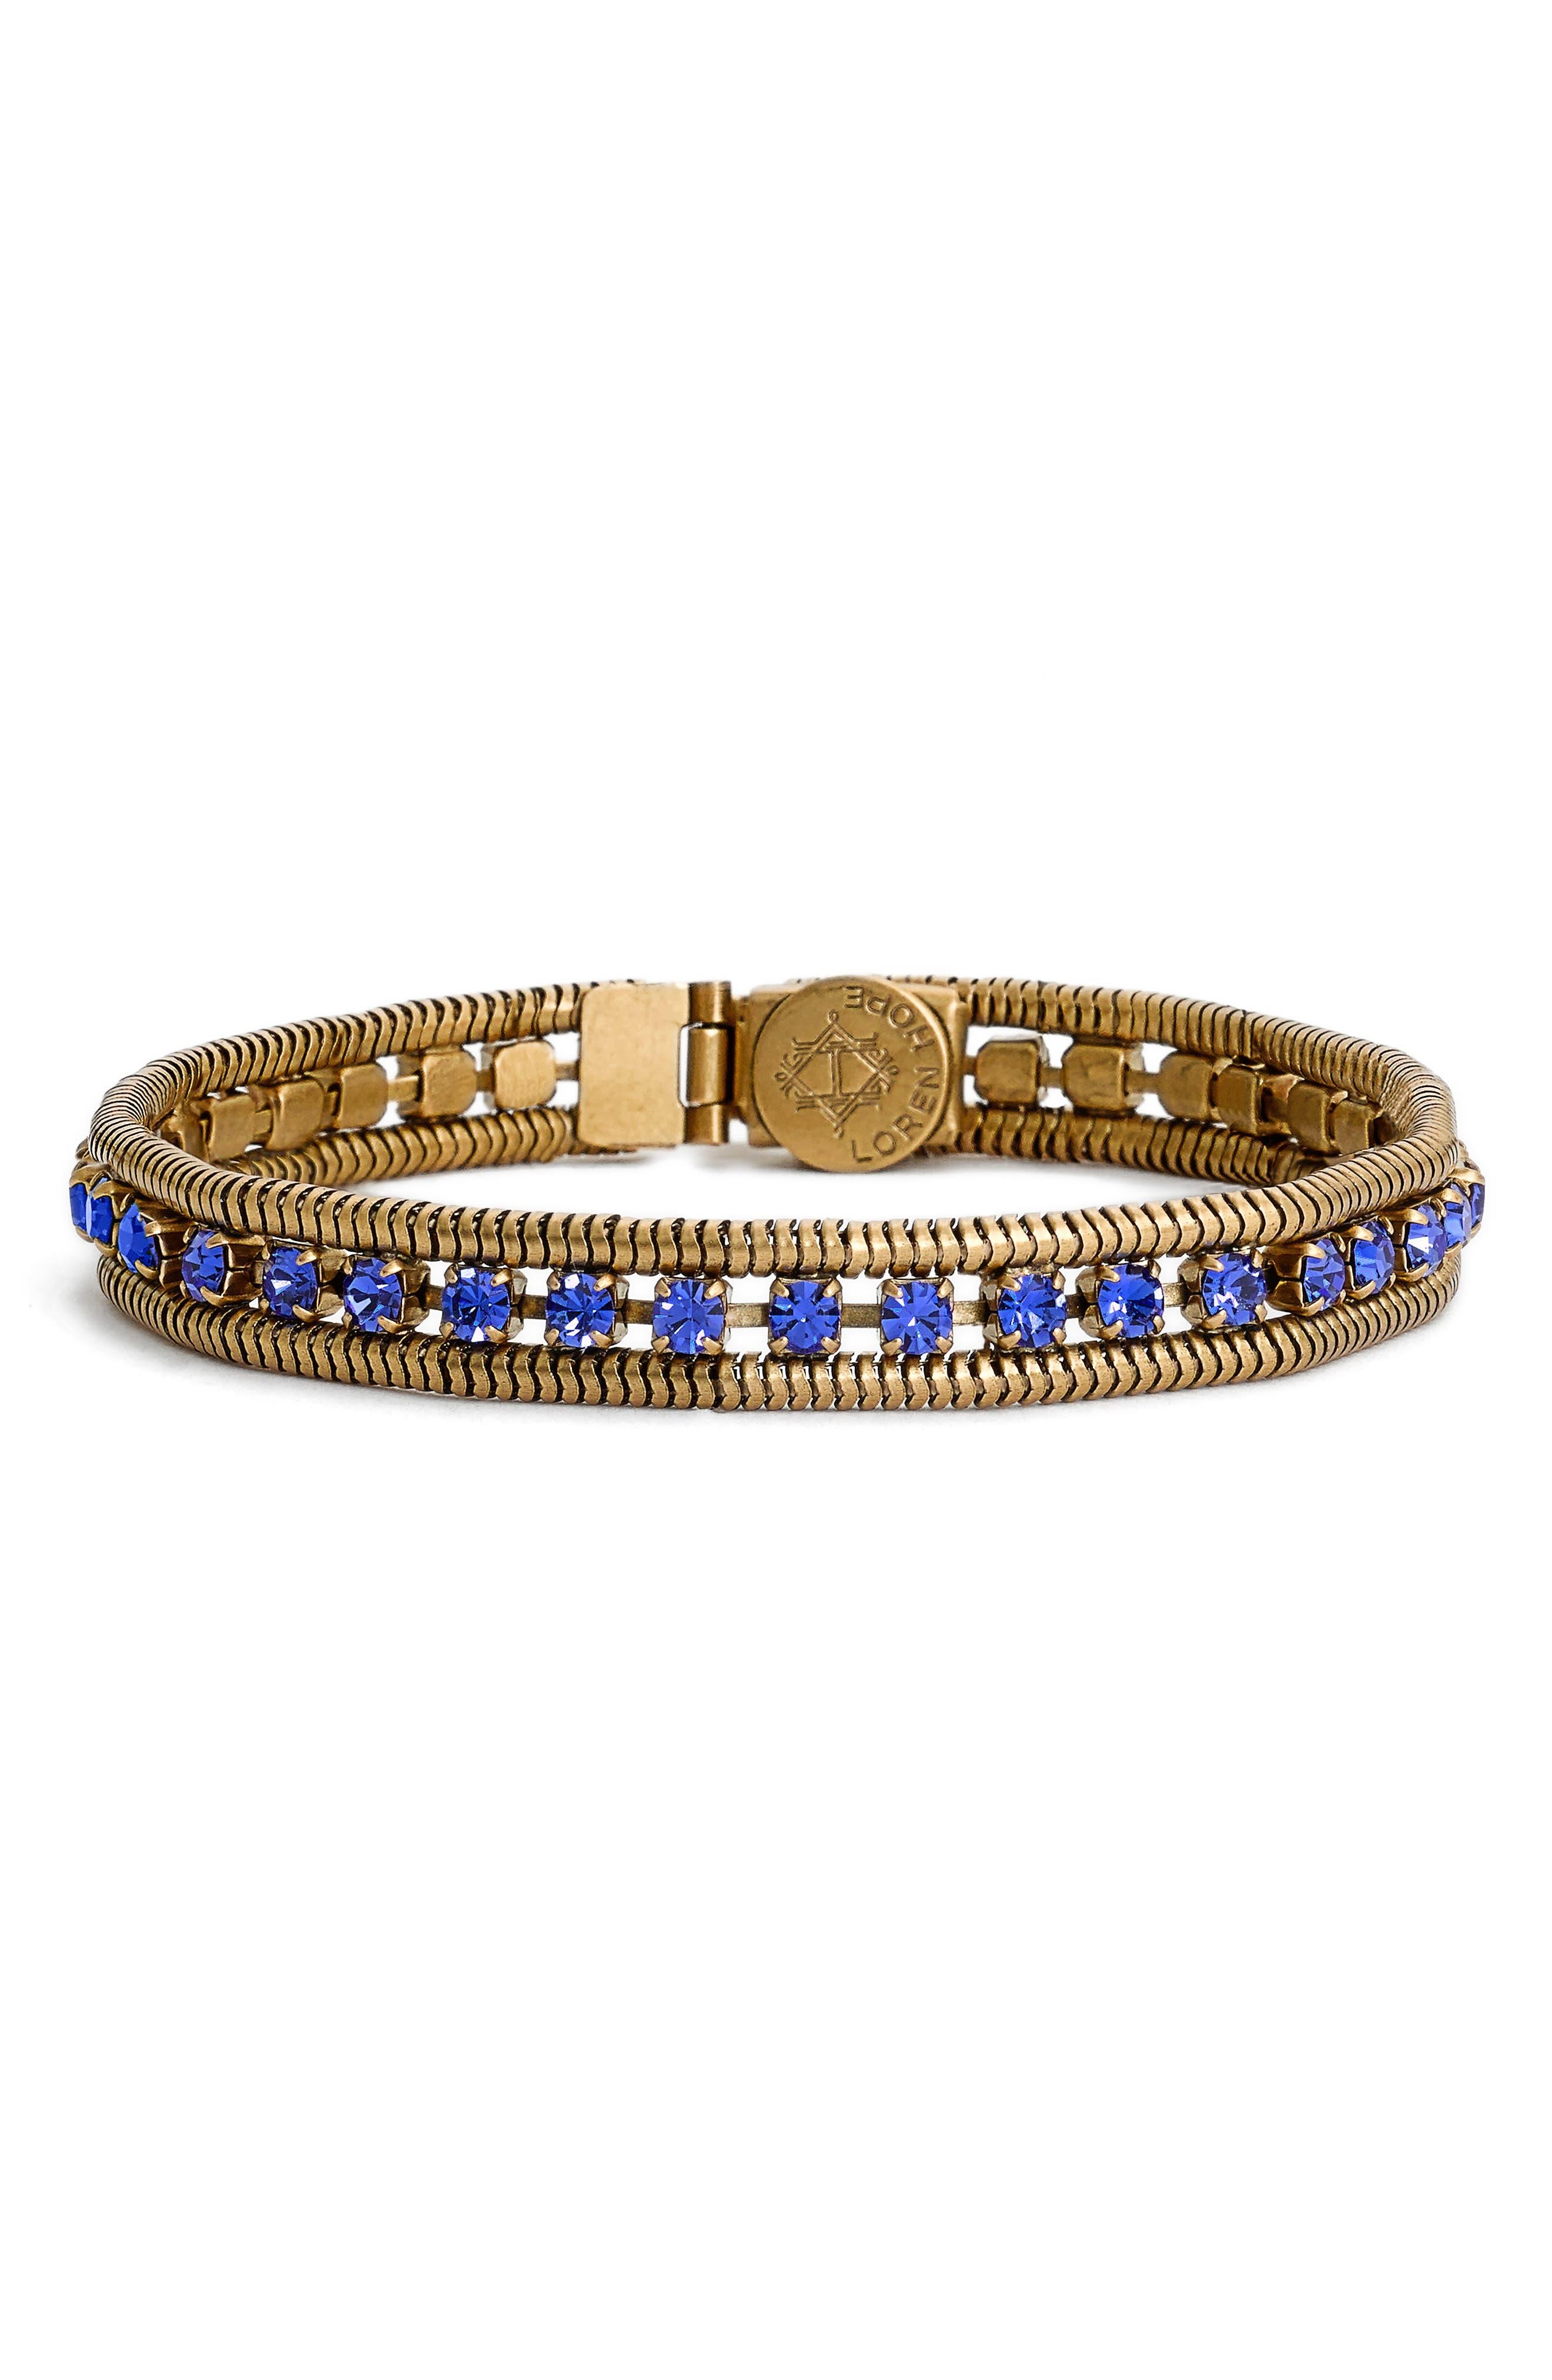 Loren Hope 'Clara' Crystal Bracelet